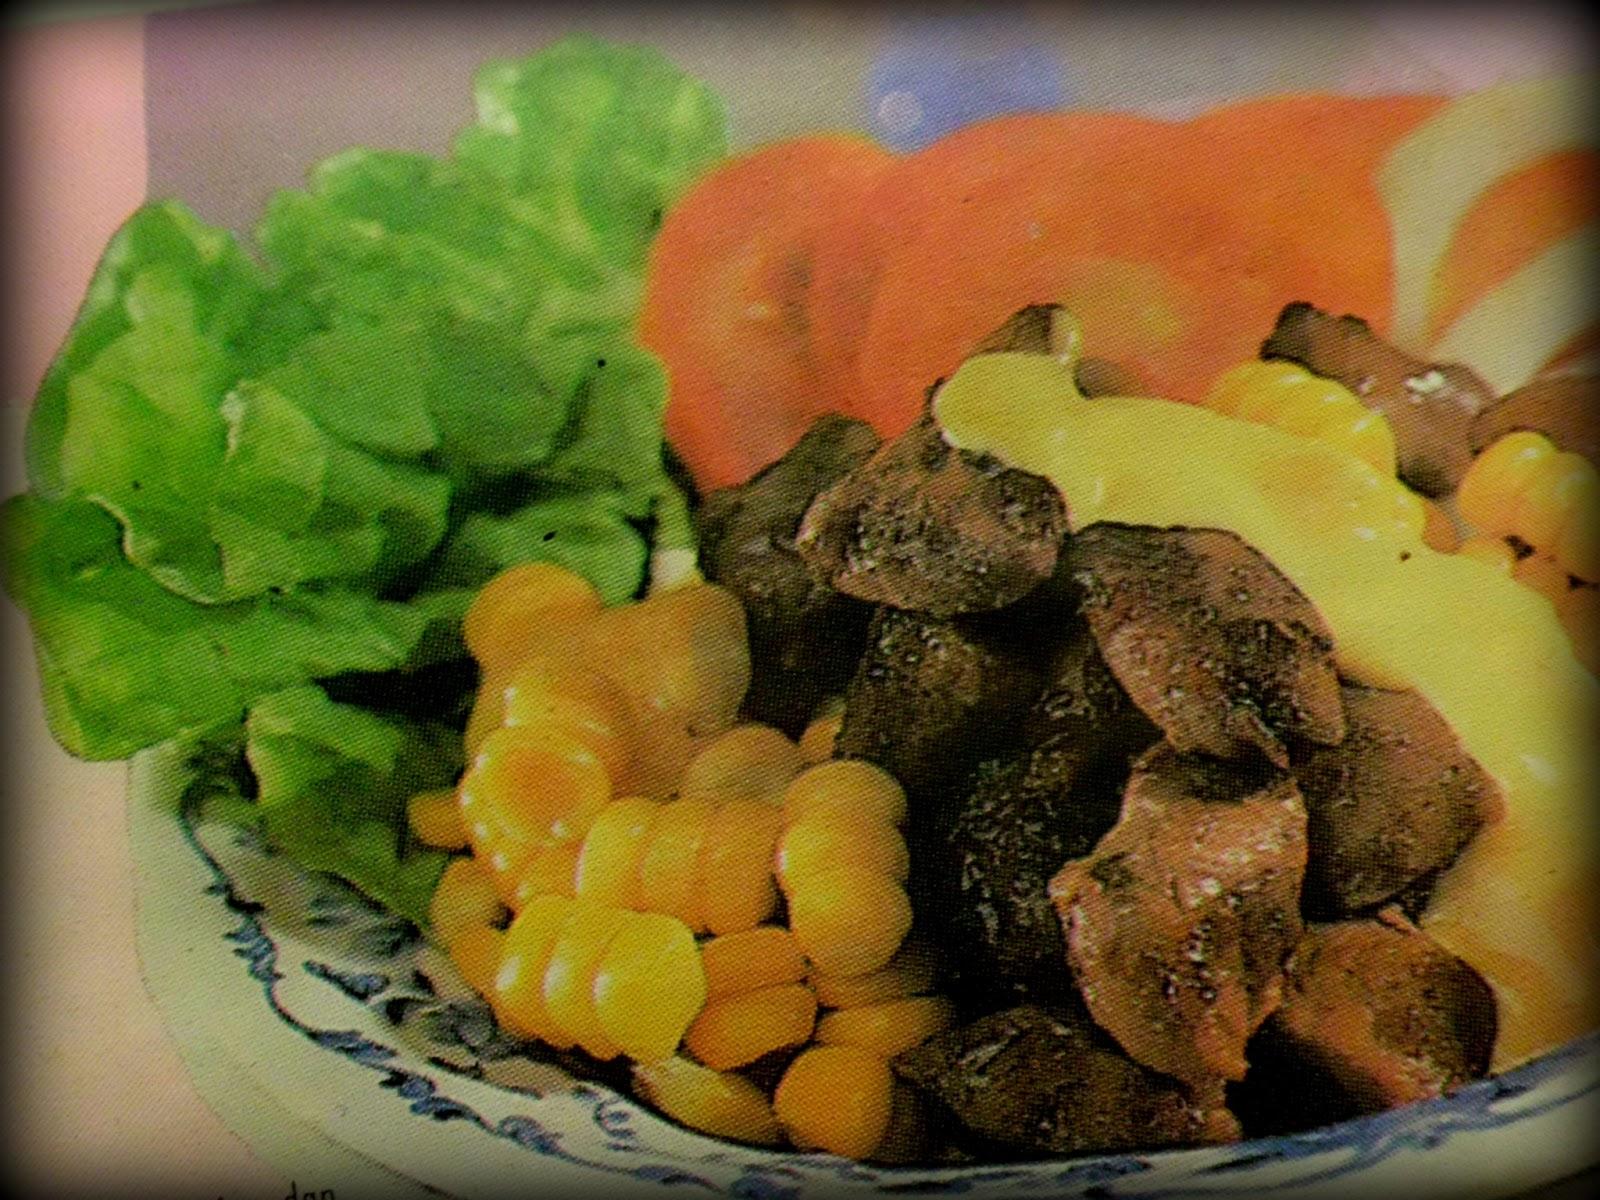 Resep Salad Sayur Ayam Mayonaise | Resep Masakan Indonesia